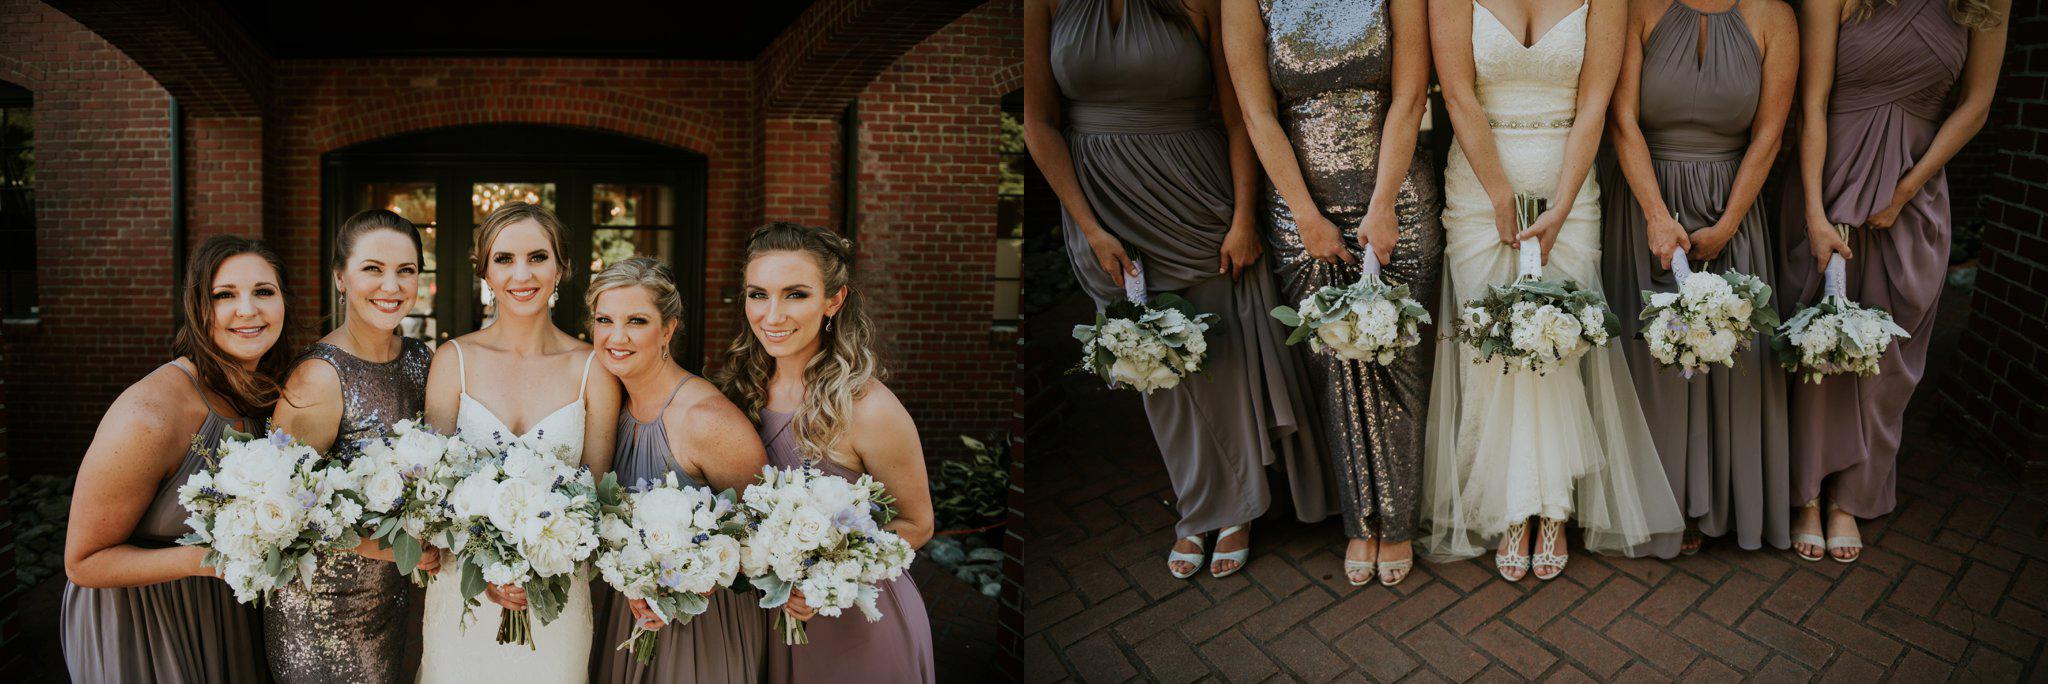 hollywood-school-house-wedding-seattle-photographer-caitlyn-nikula-56.jpg